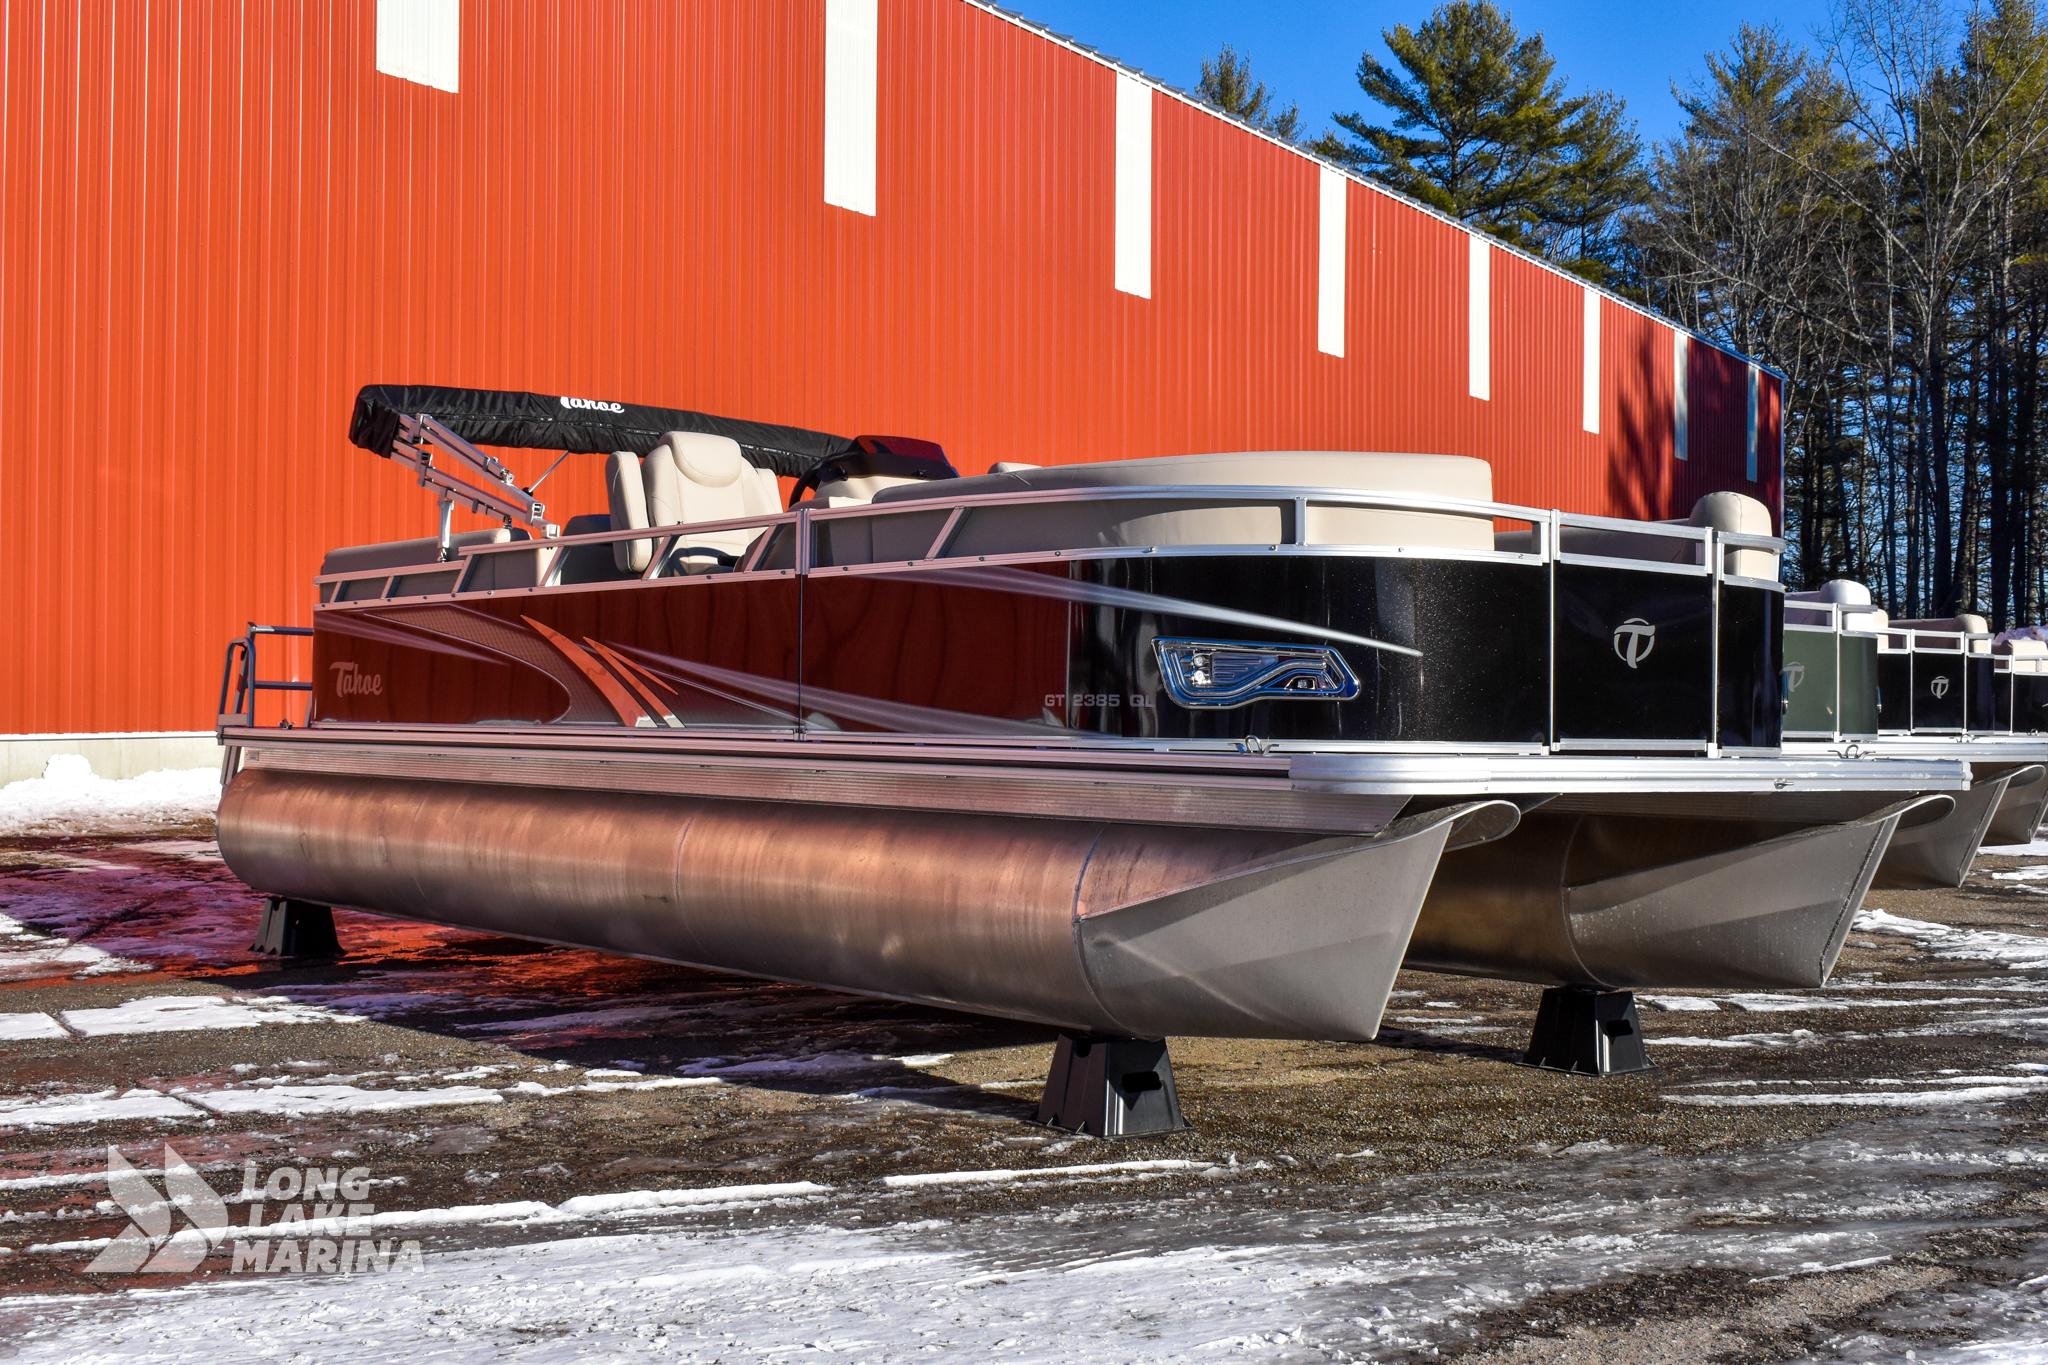 2021 Tahoe GT Quad Lounger Carina Neutra thumbnail